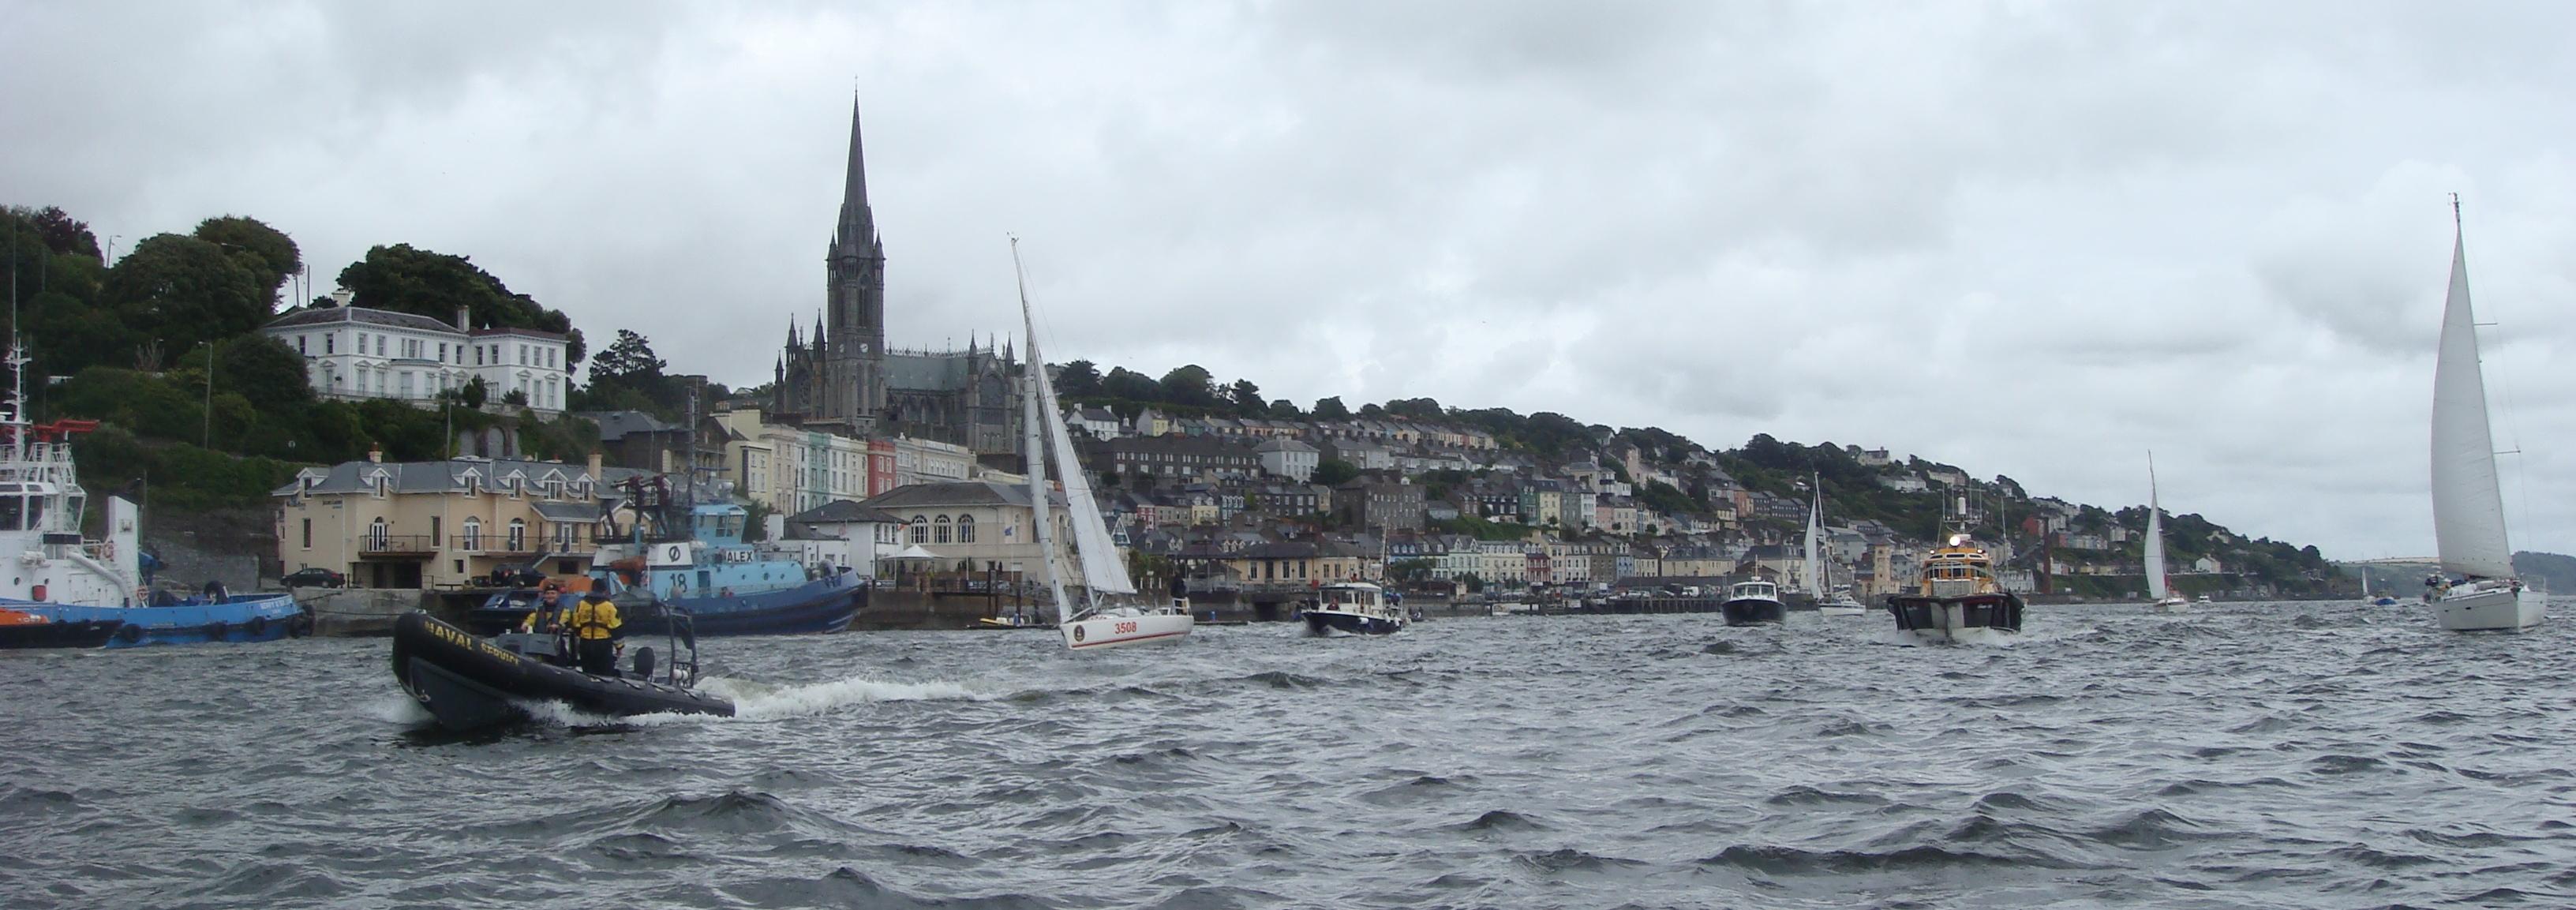 http://www.dinah.sail.ie/wp-content/uploads/2009/08/7-Town-Front.JPG